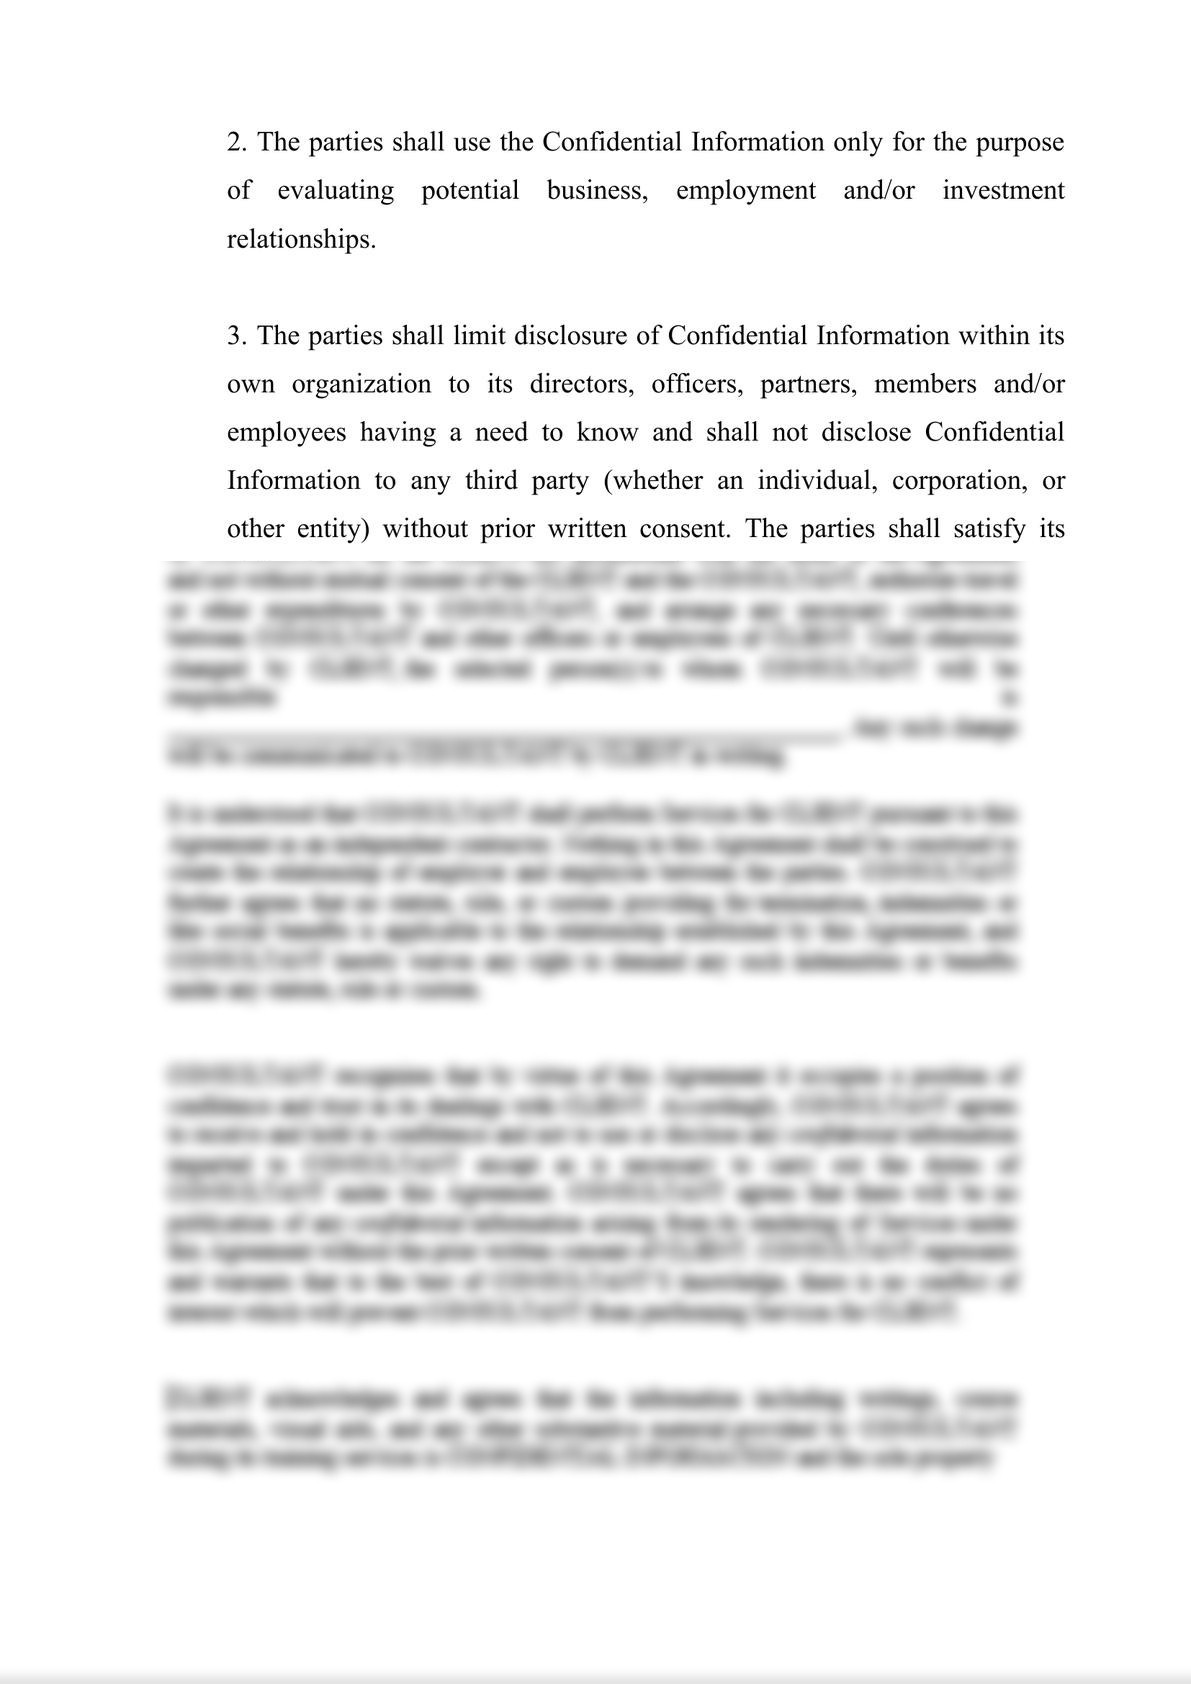 Mutual Non-Disclosure Agreement-1